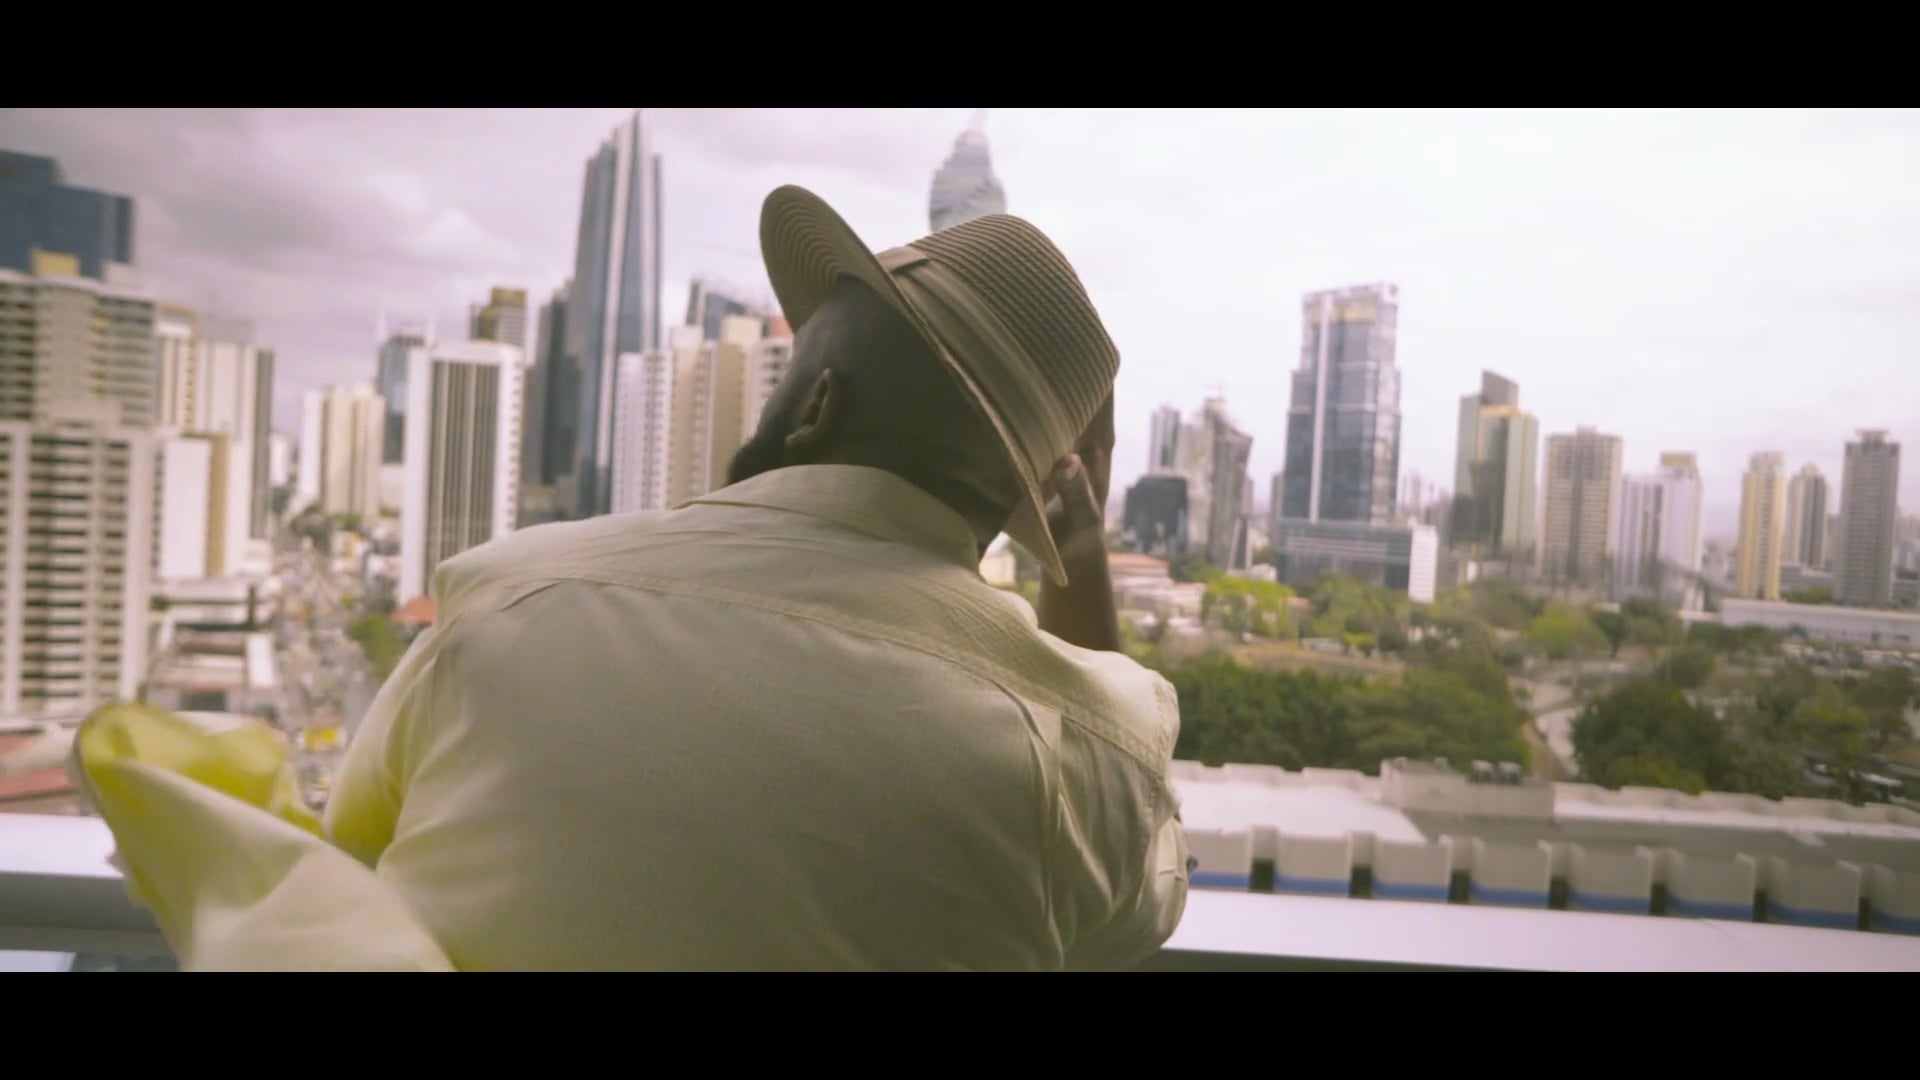 The Panama Experience